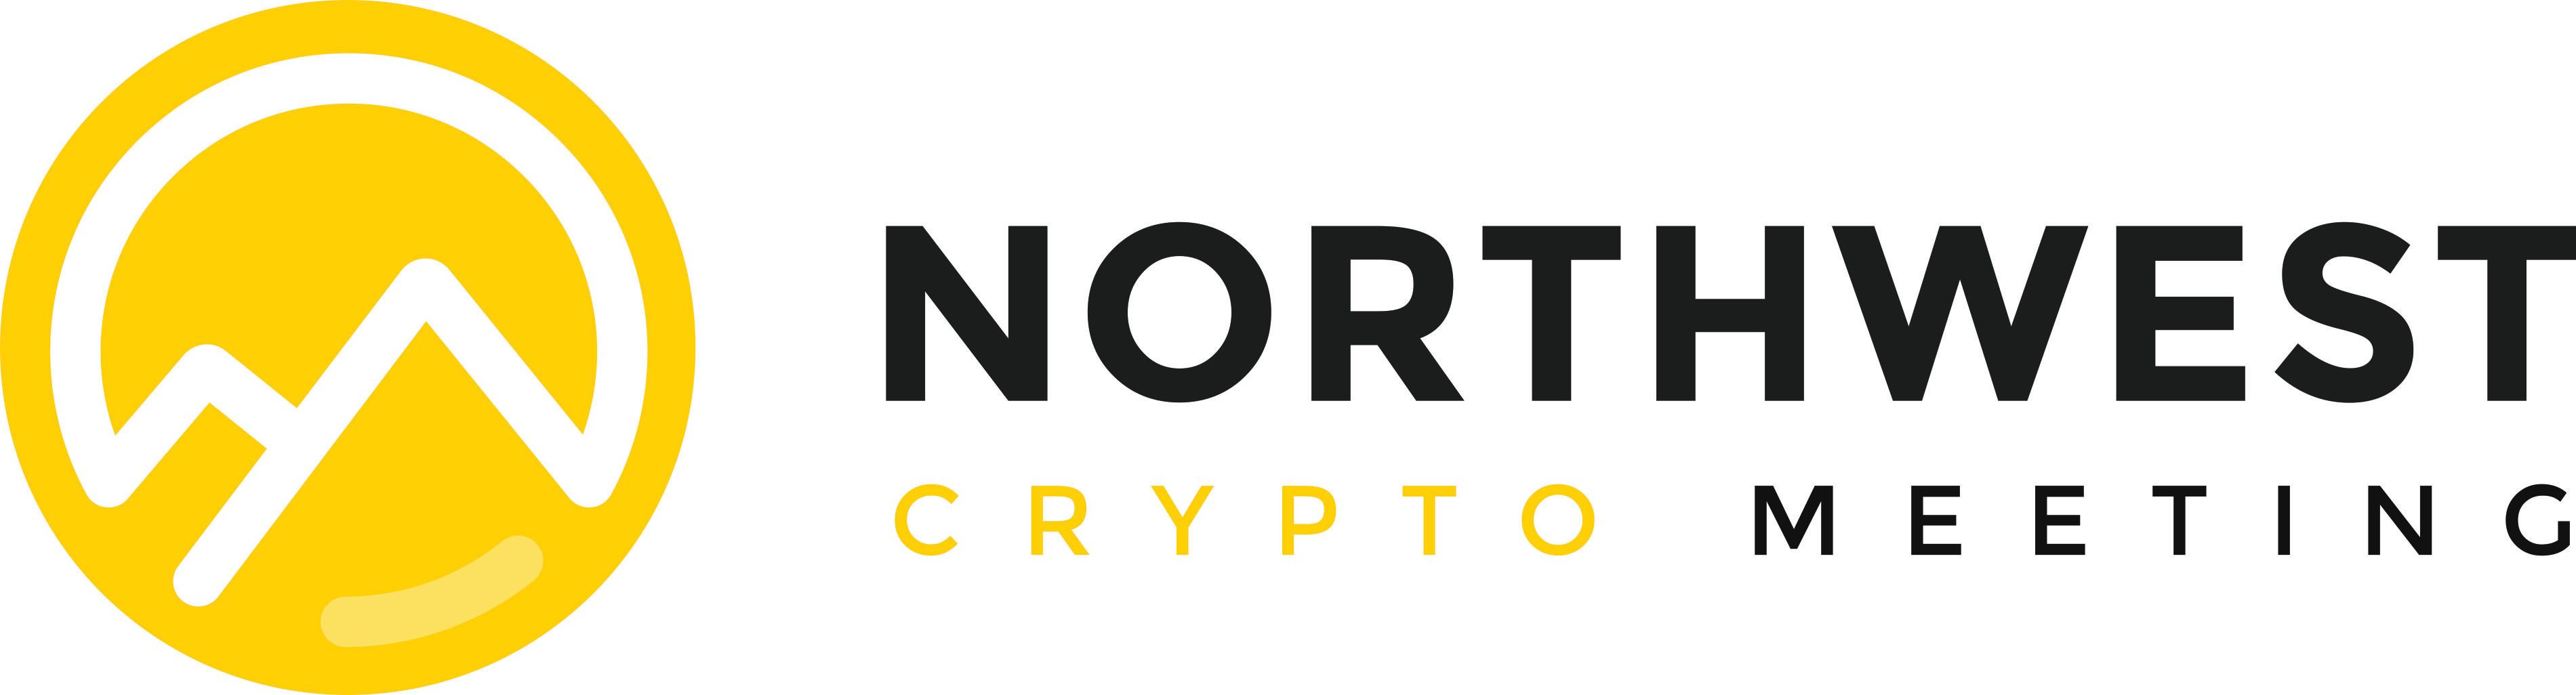 The Crypto Northwest Meeting